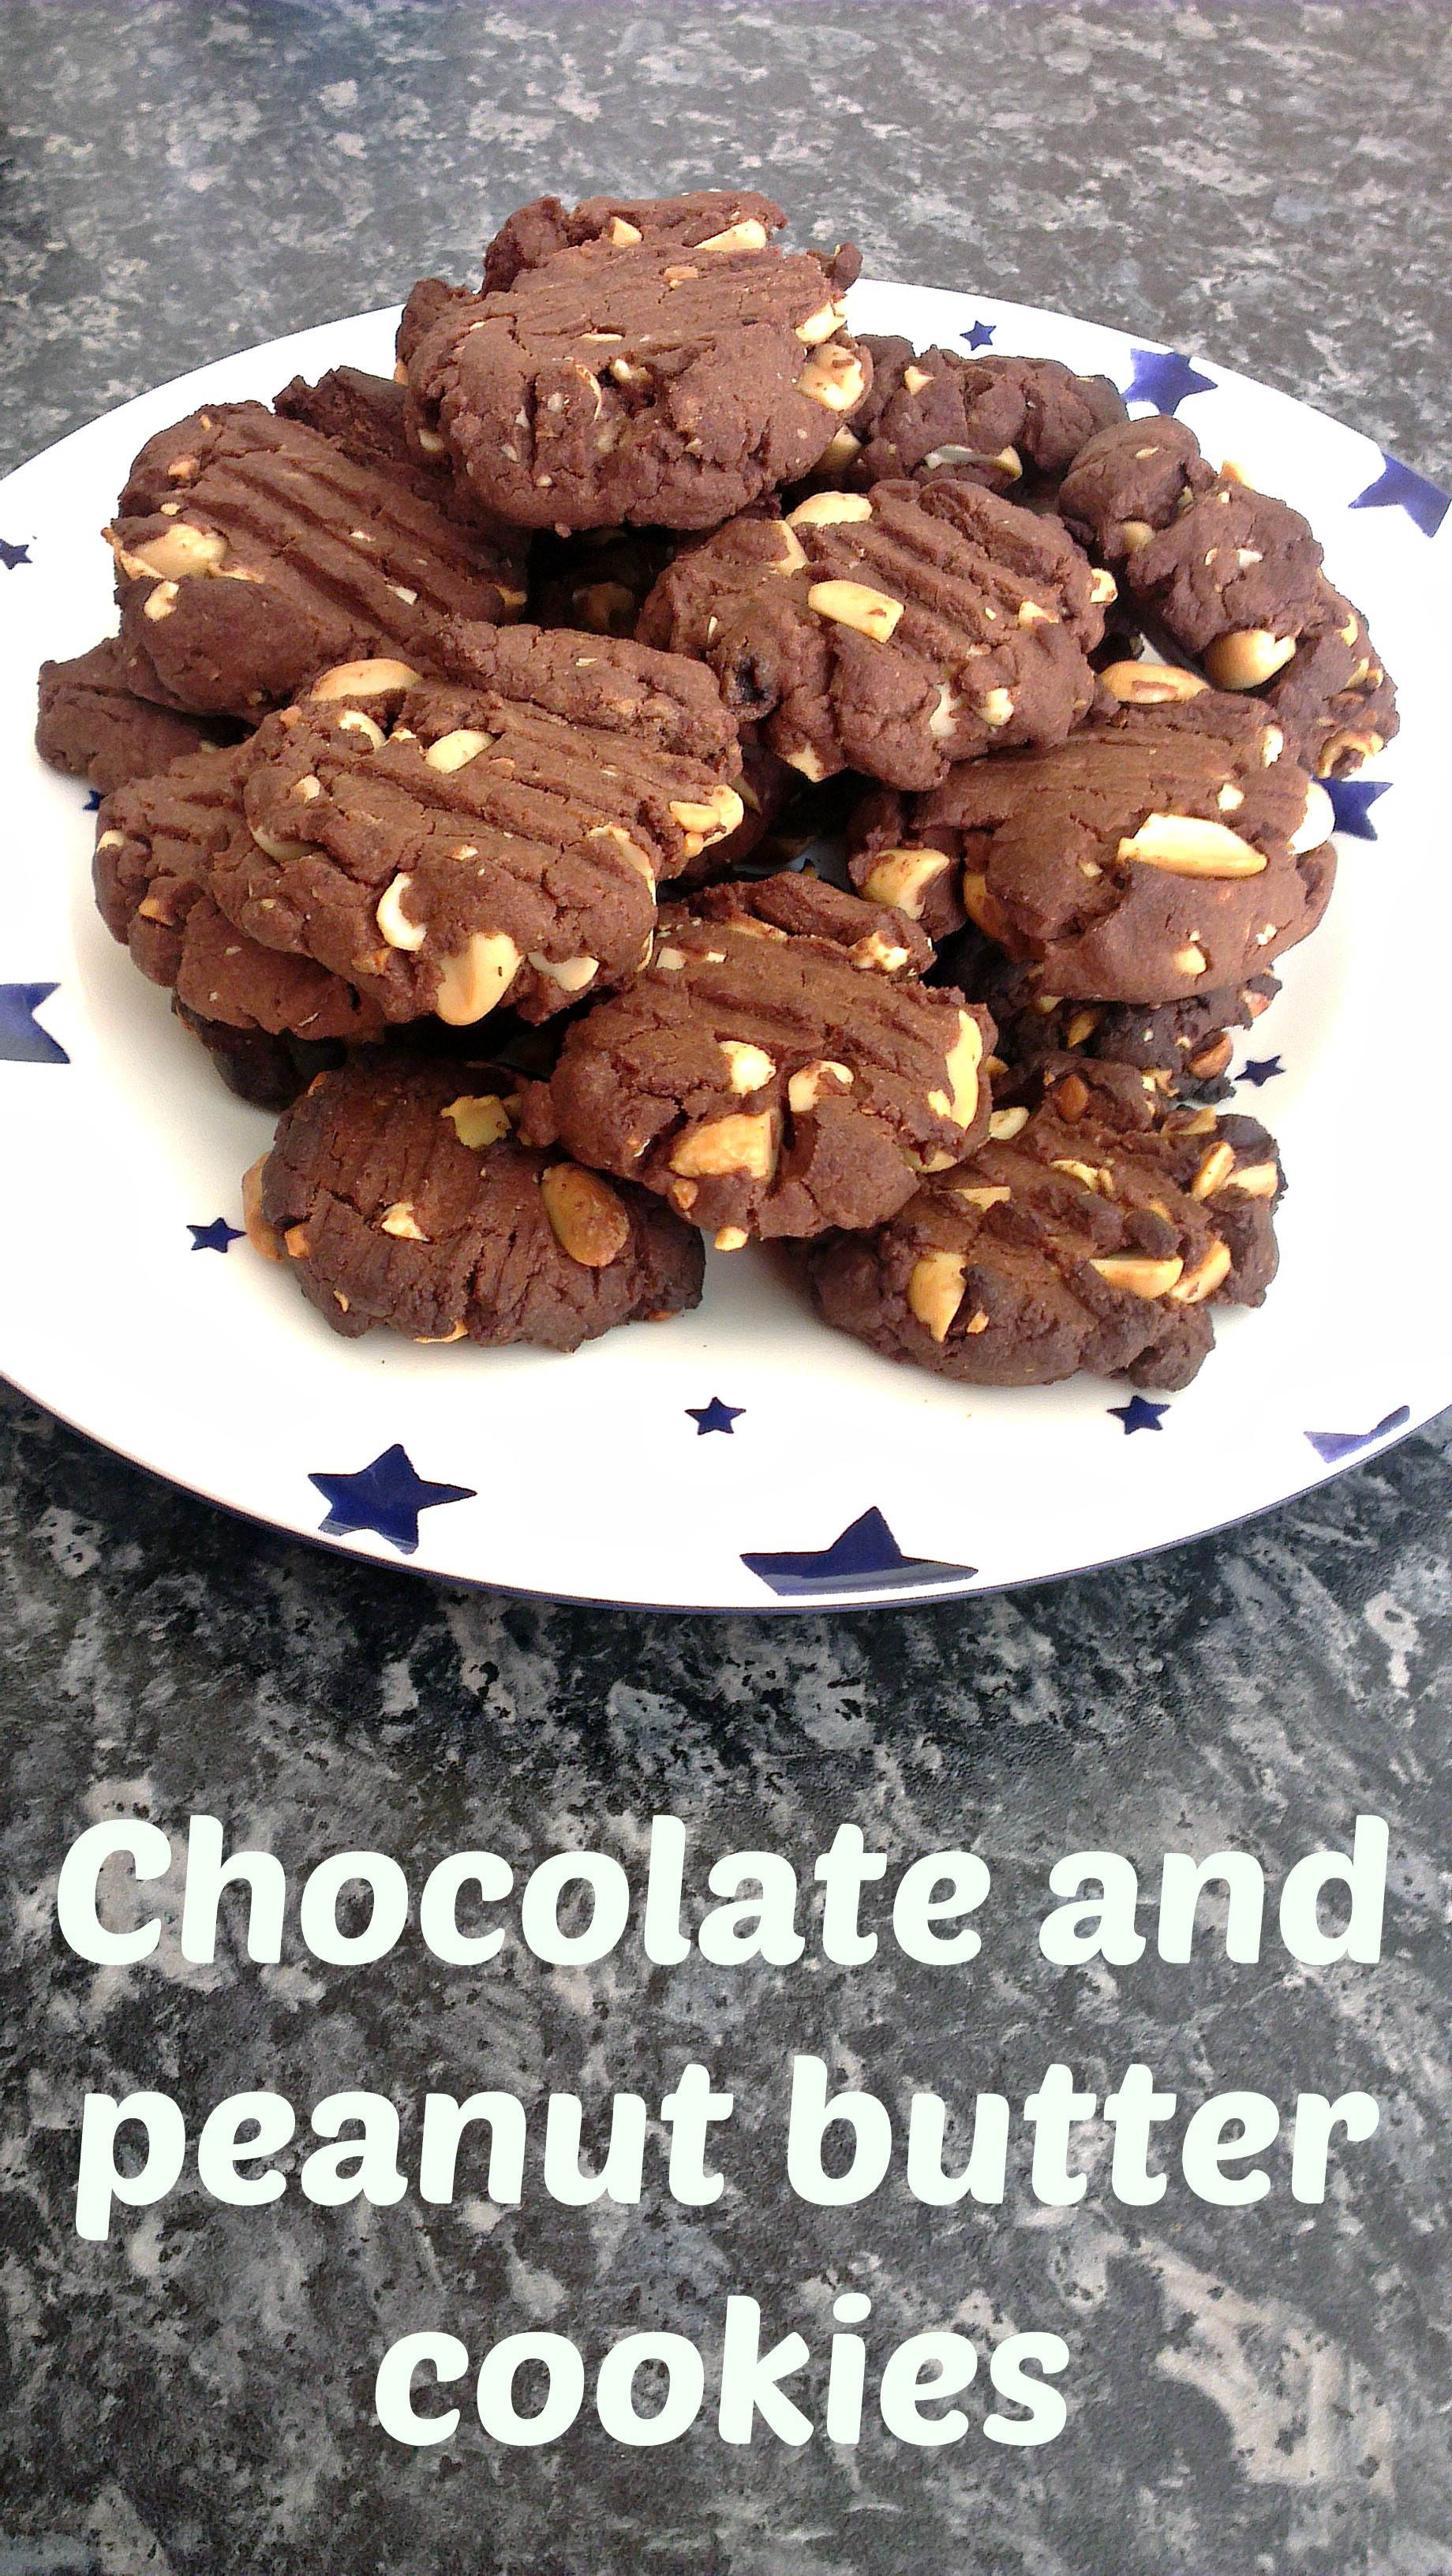 RECIPE: Chocolate and peanut butter cookies - Slummy single mummy